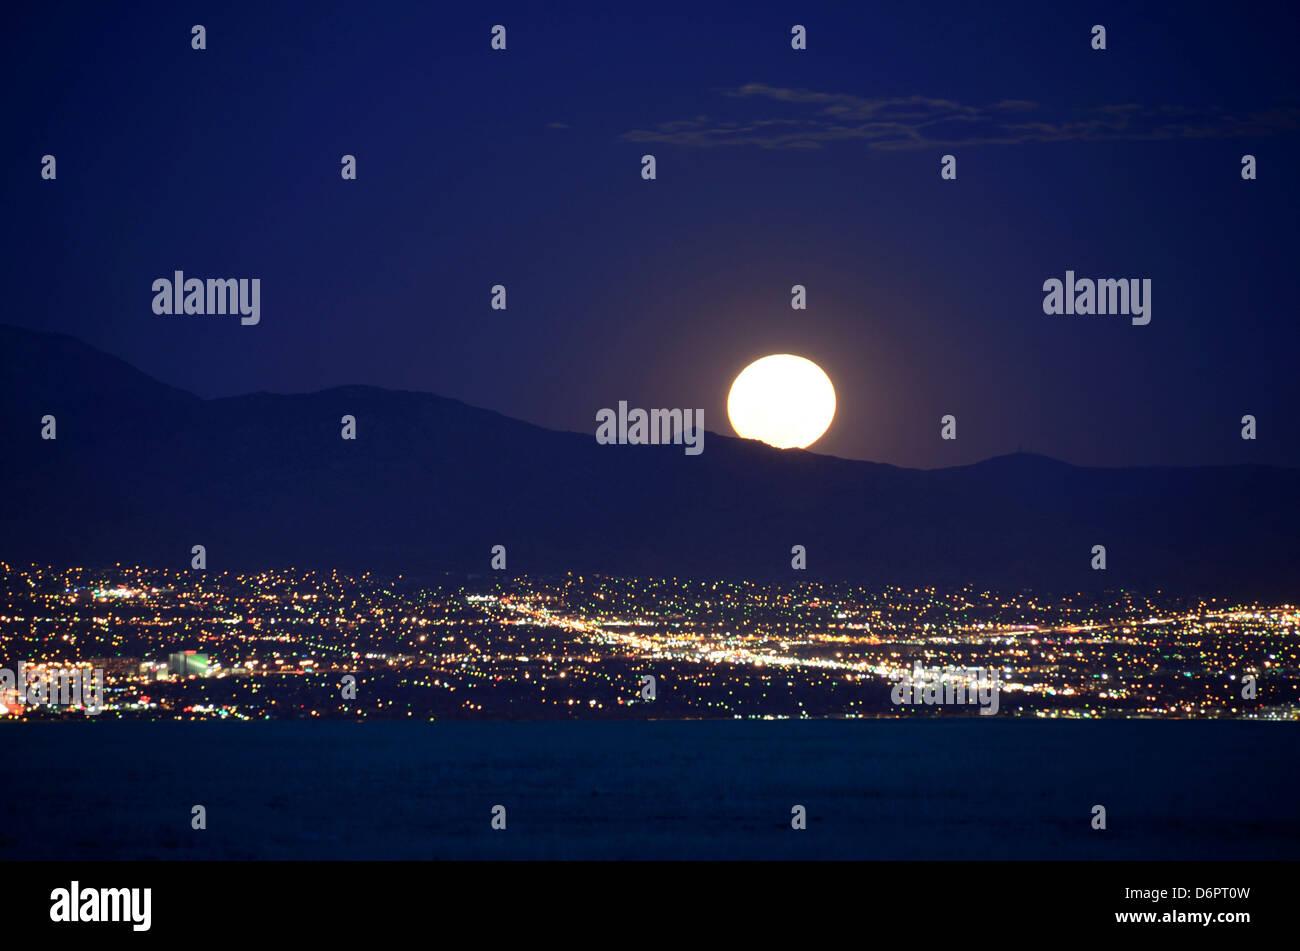 2bf3f5b4a5d71 Super Moon Stock Photos   Super Moon Stock Images - Alamy